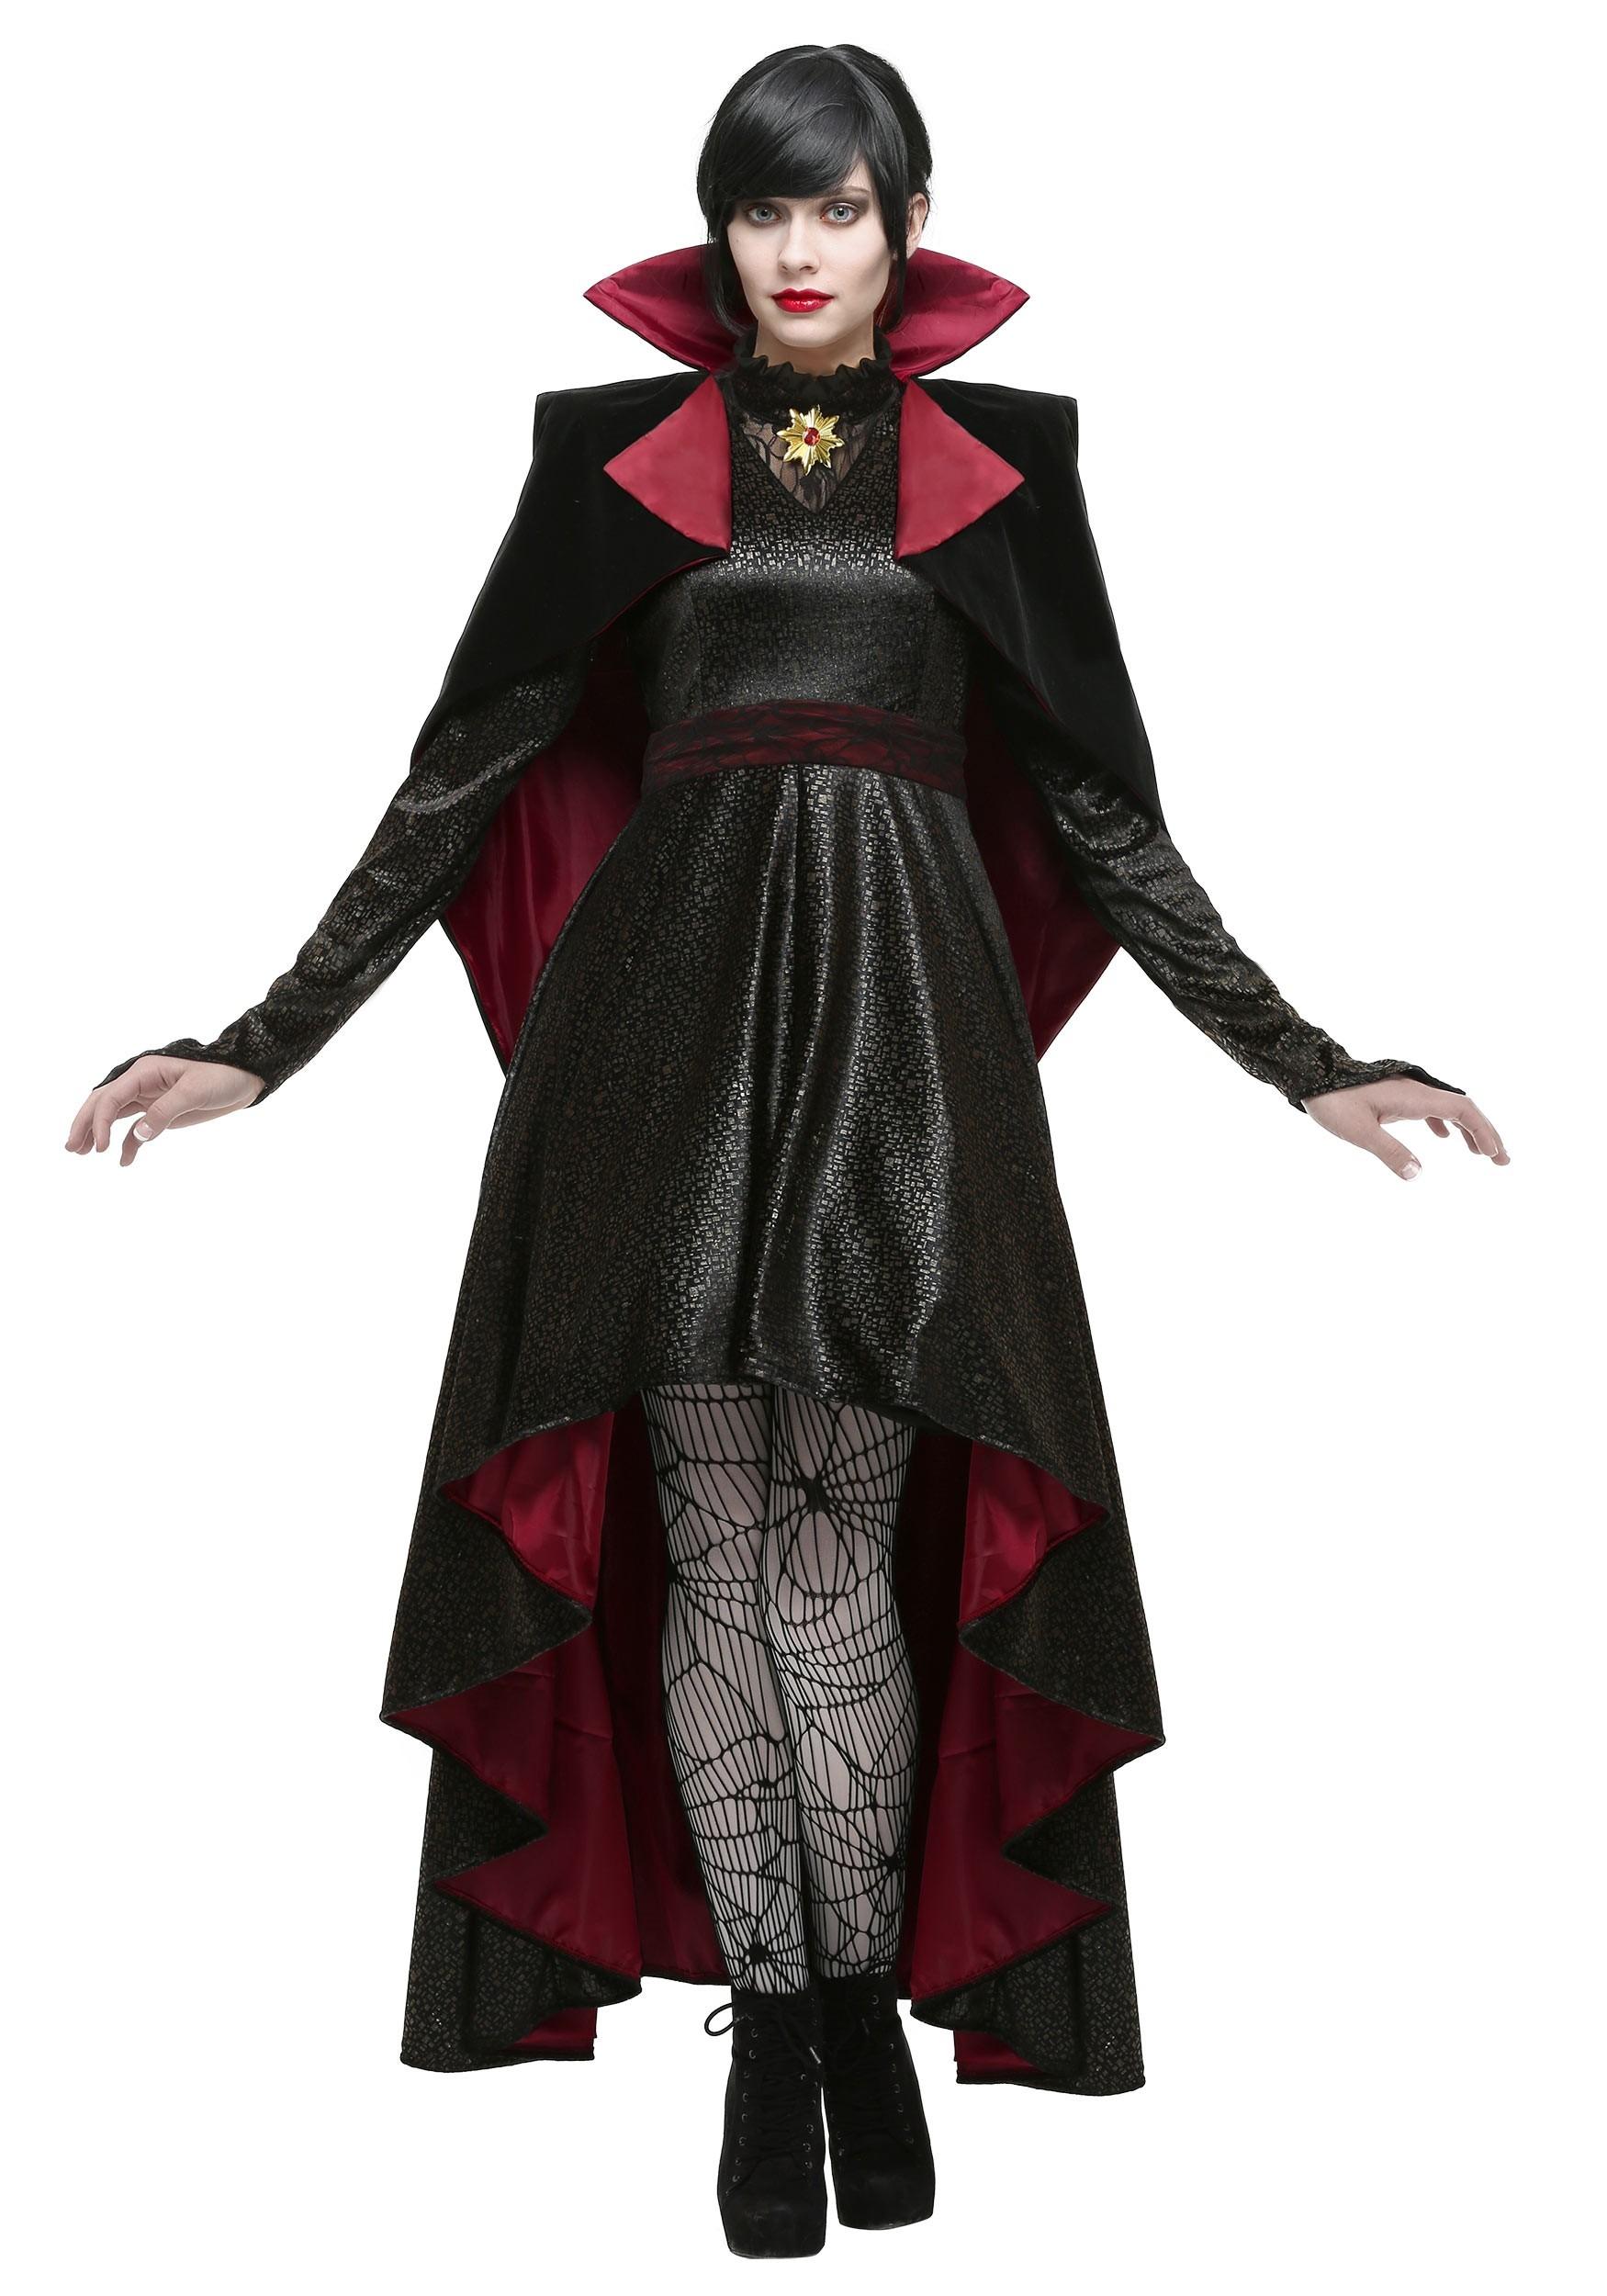 vampire vixen costume. Black Bedroom Furniture Sets. Home Design Ideas